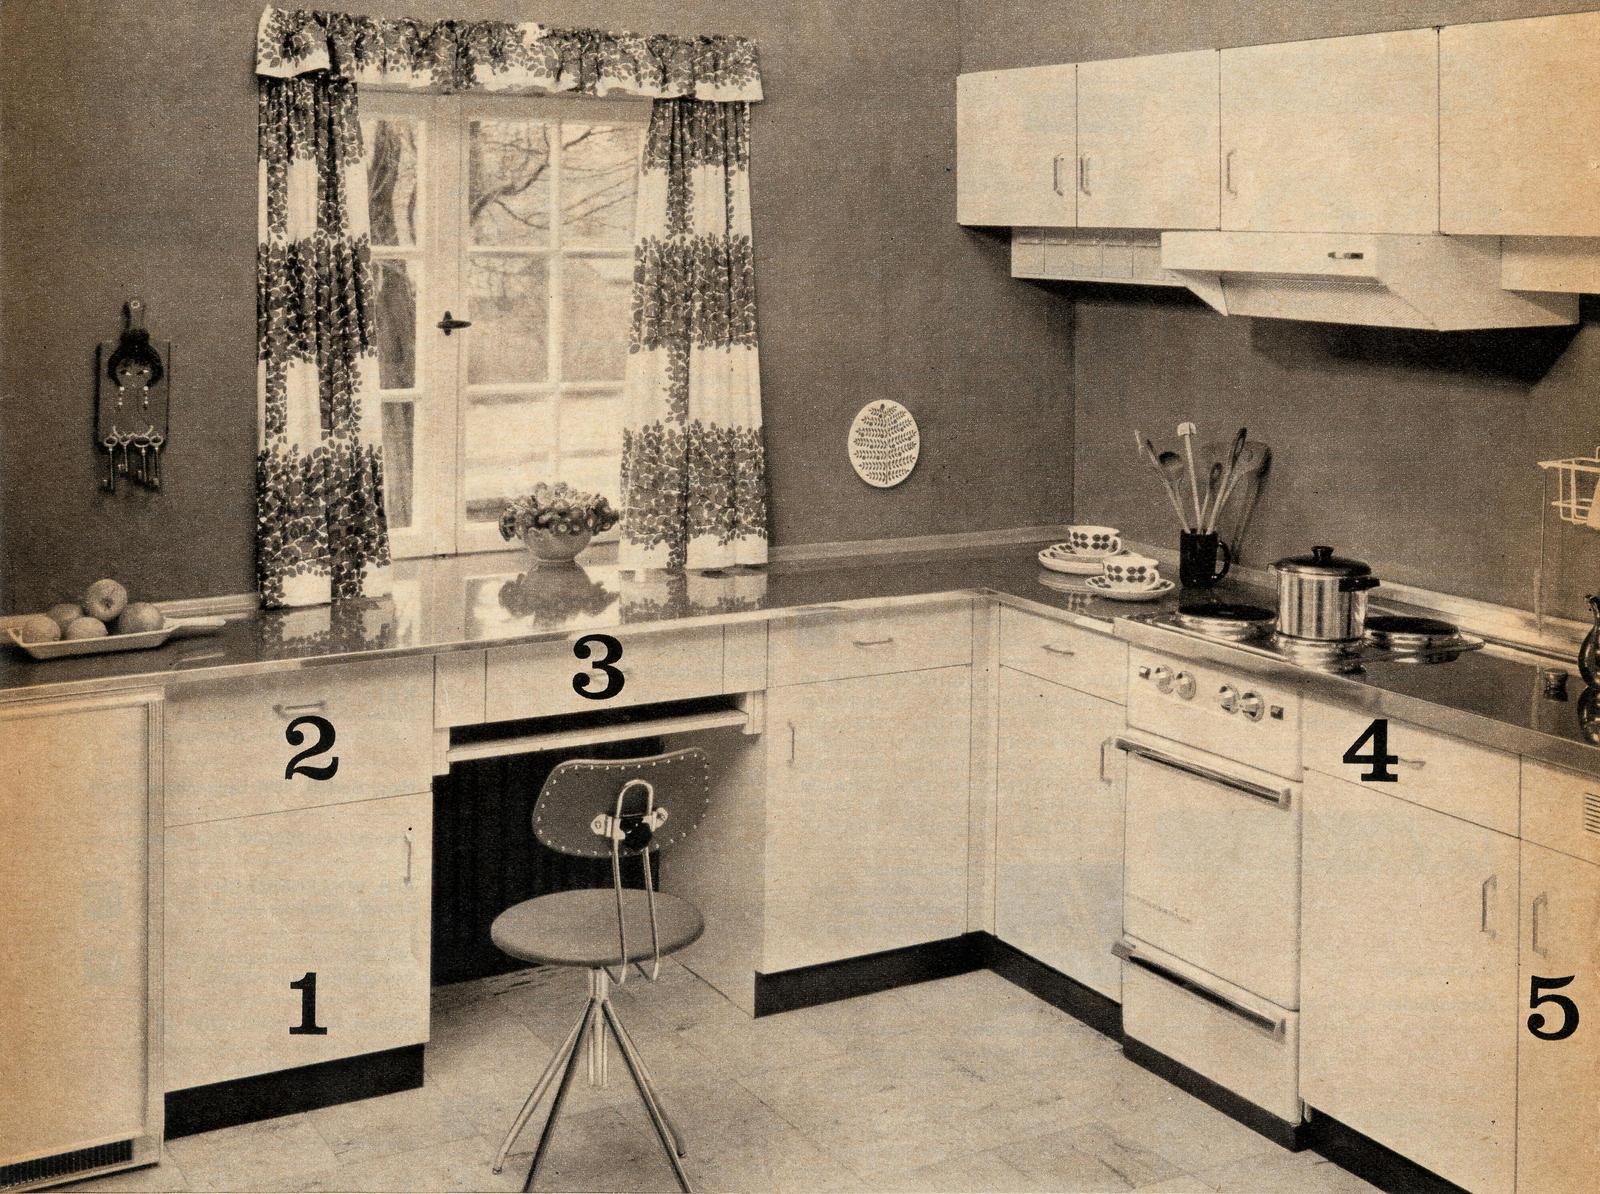 Kitchen Options by pandoraicons